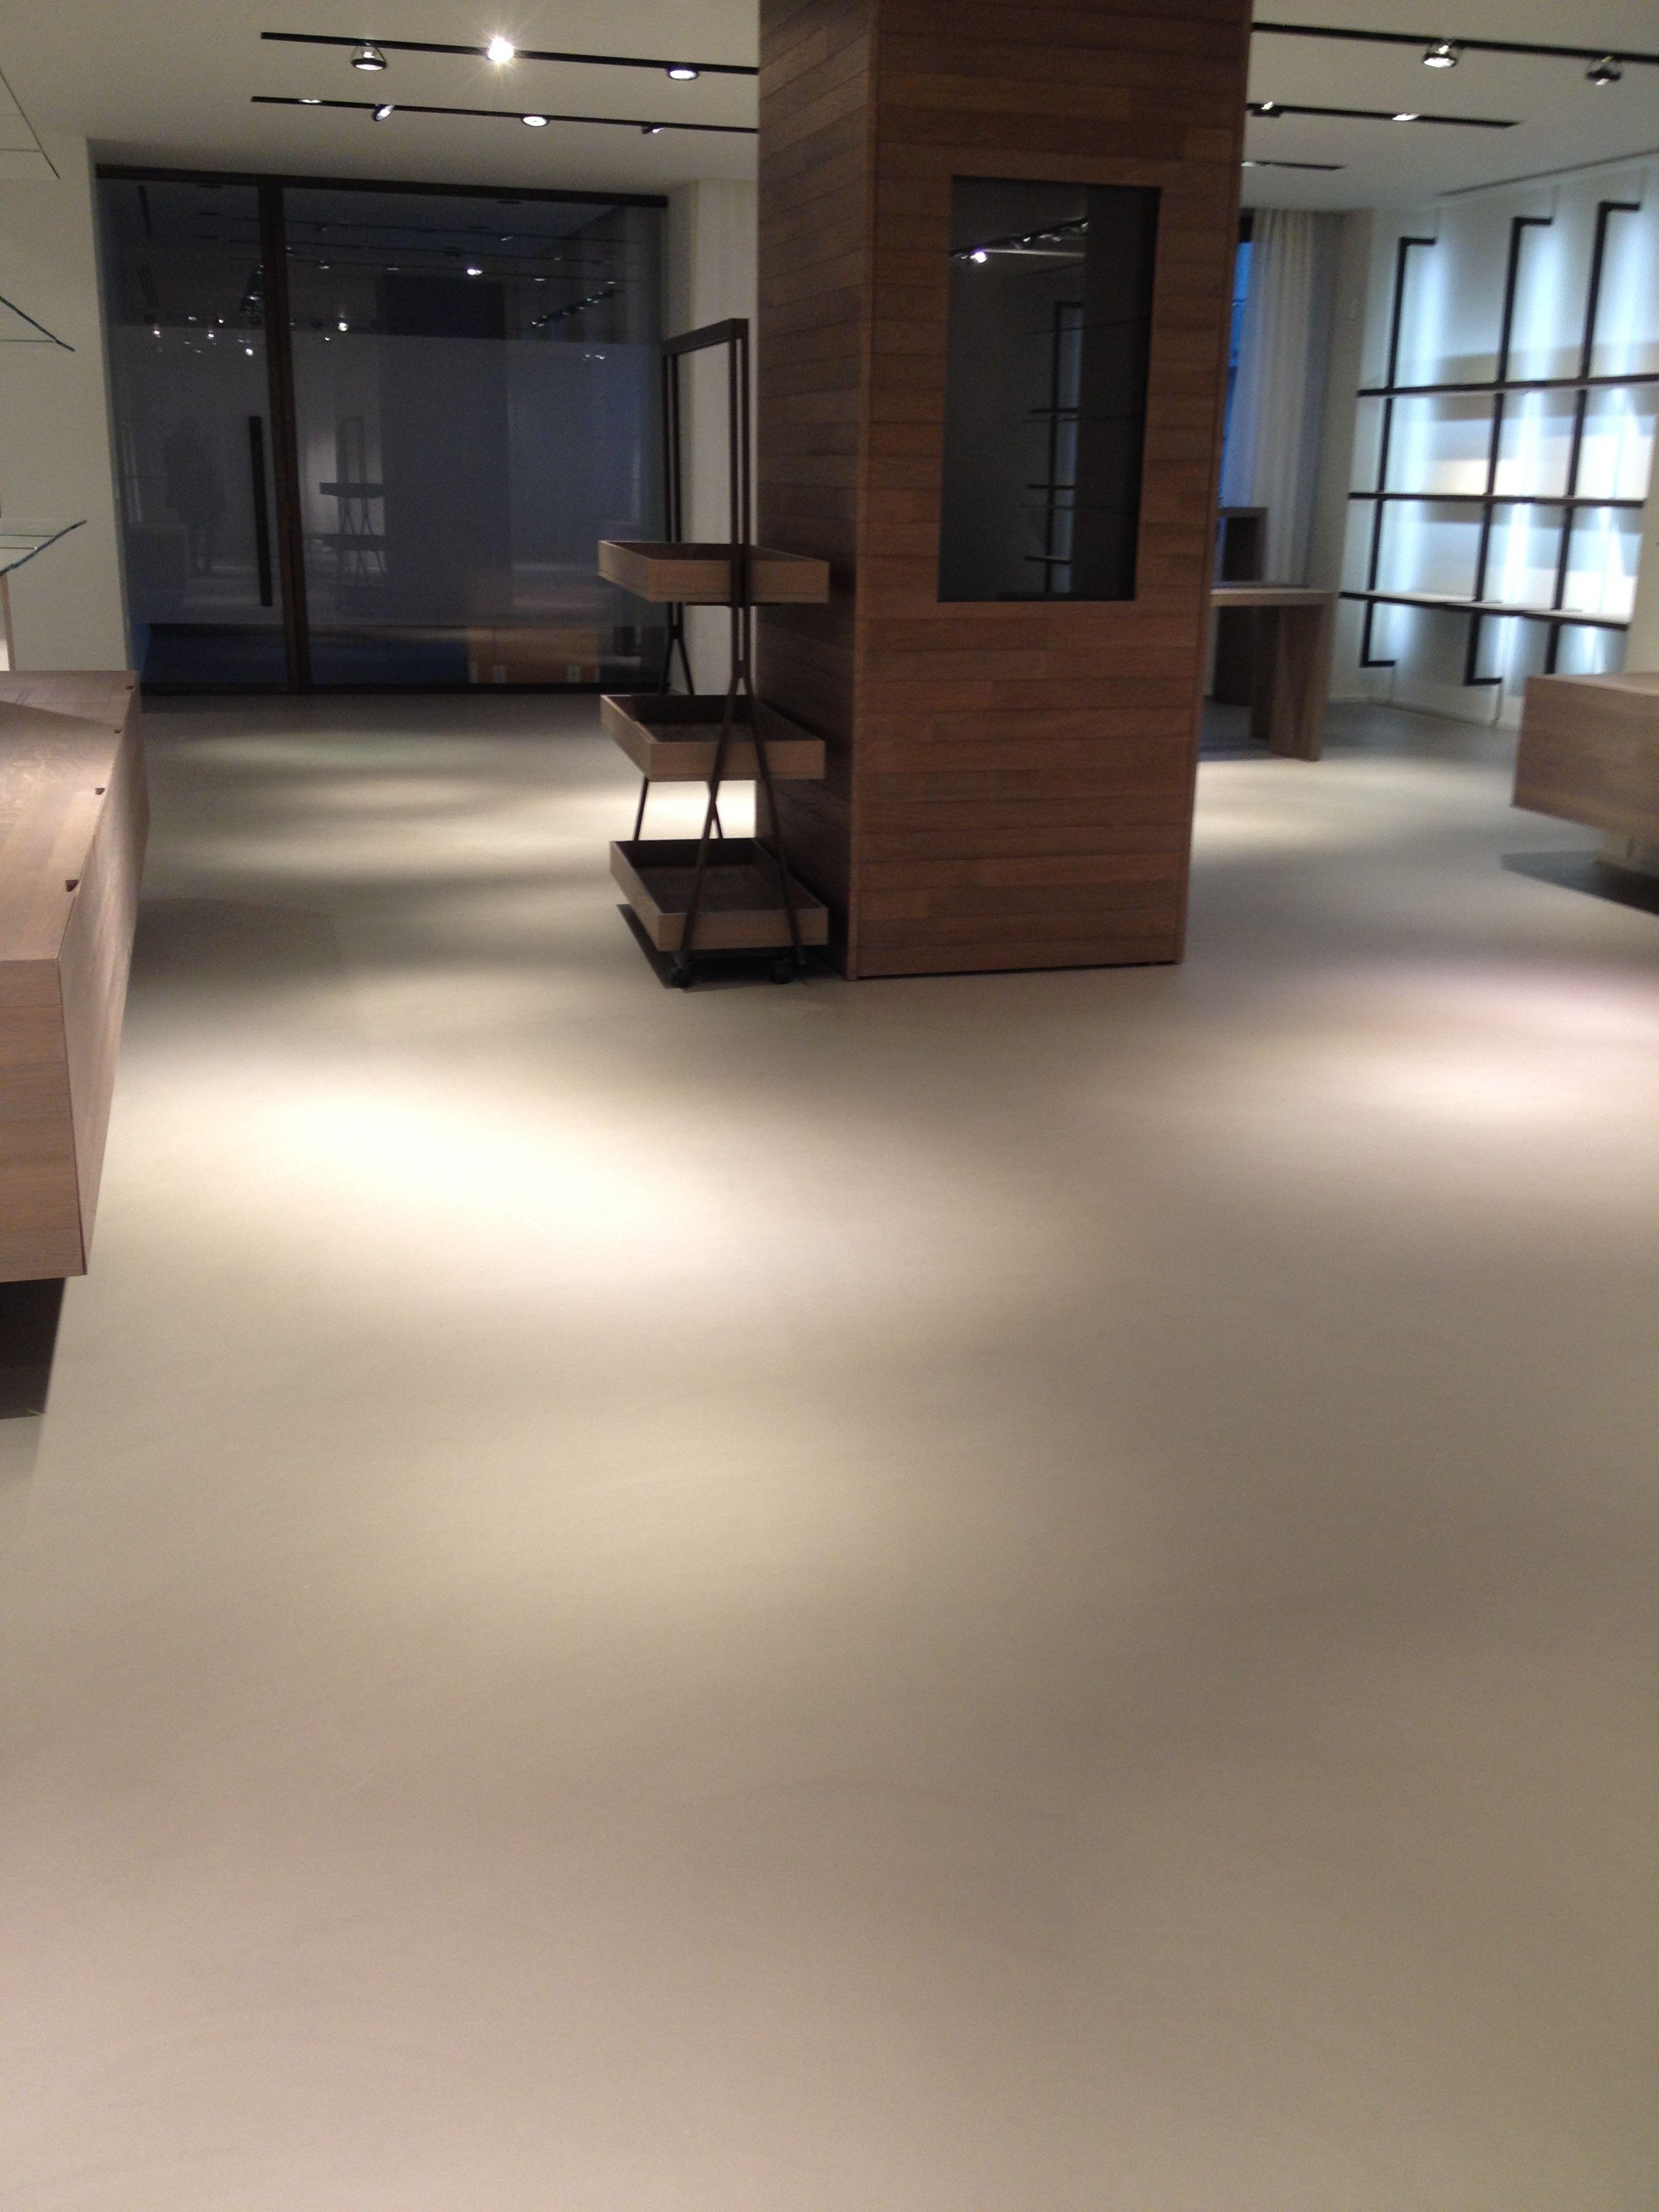 Resine Per Pavimenti Casa.Hd Surface Cemento Resina Pavimenticontinui Resina